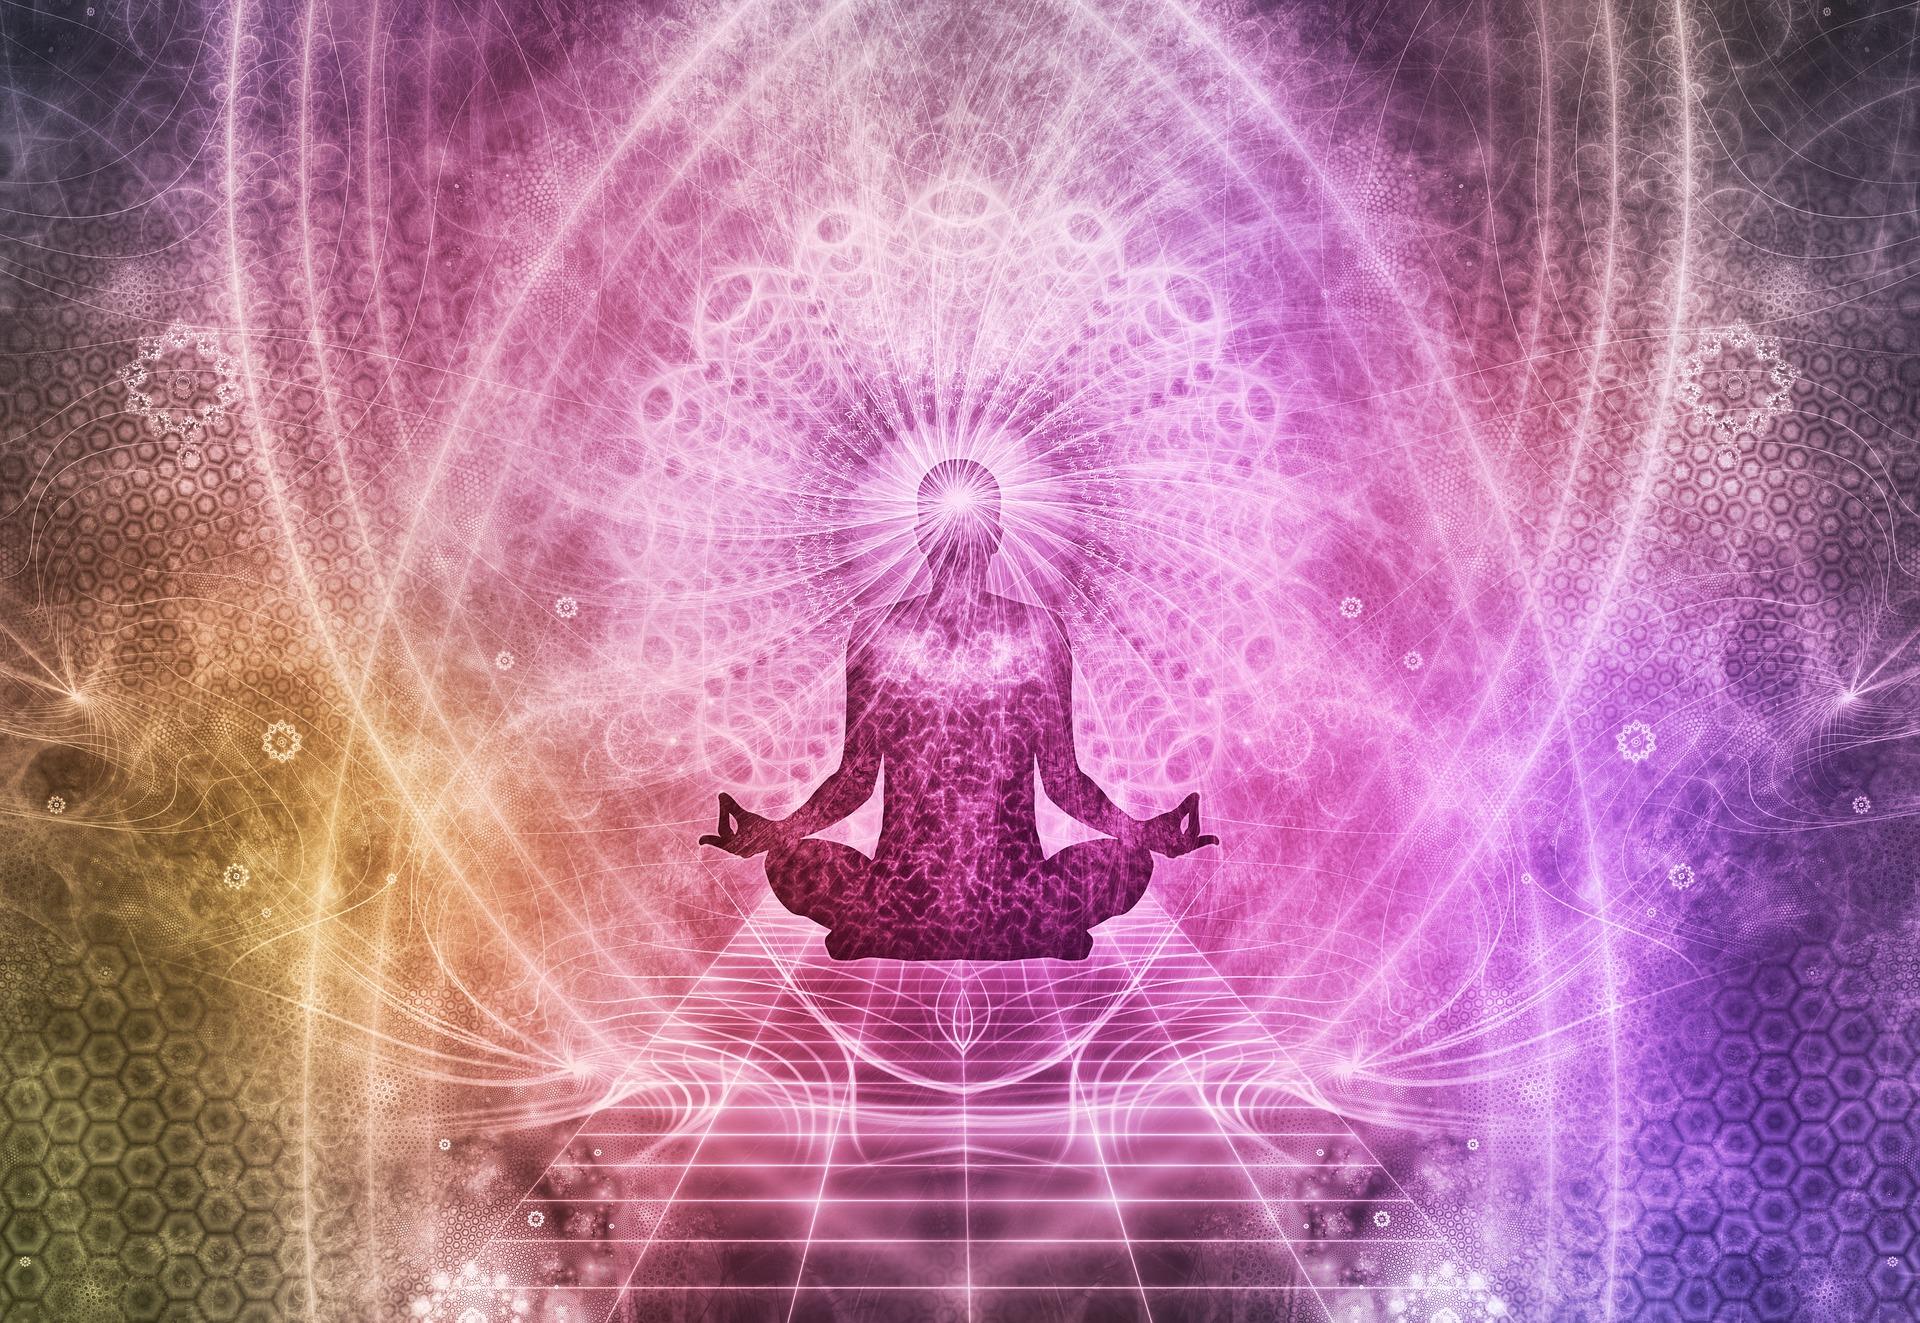 Feel the resonant, cosmic, potent, masculo/feminine, Gaia/Kwan Yin presence